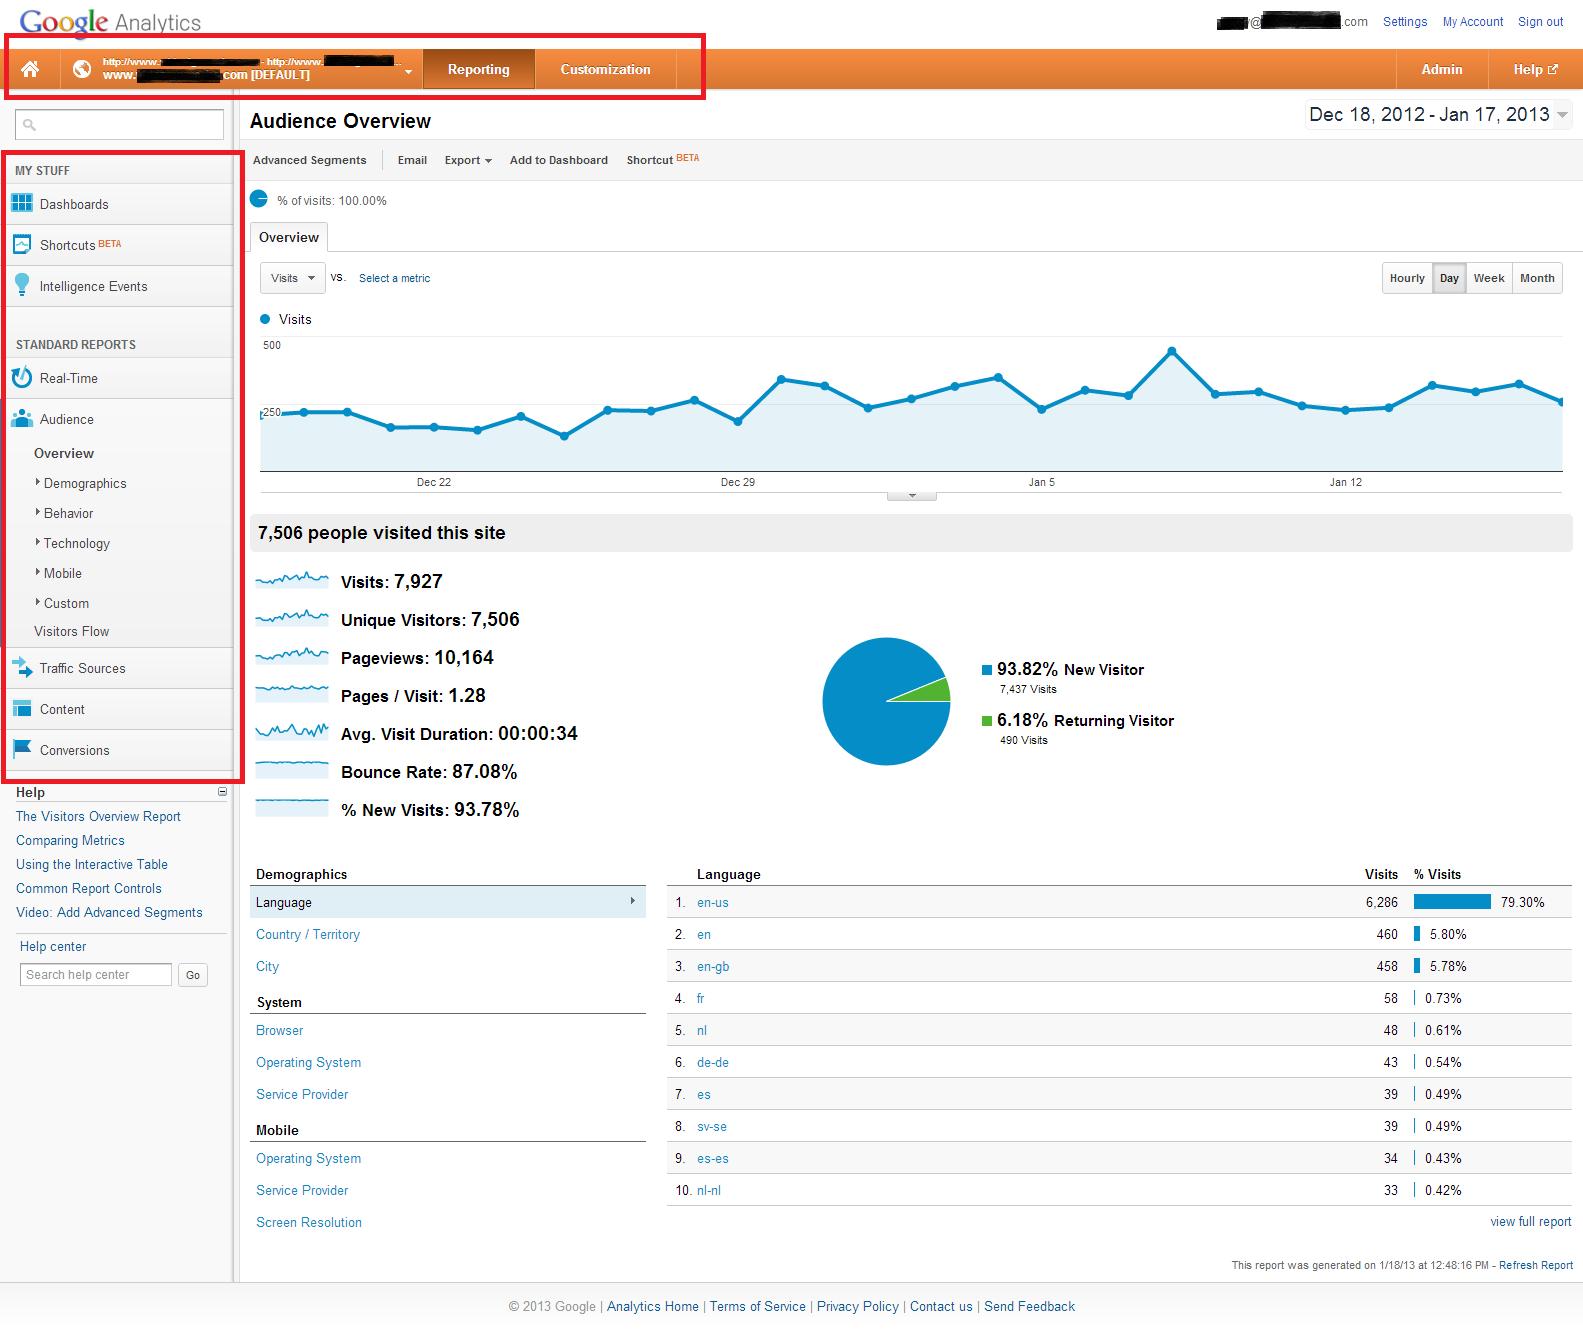 Google Analytics Interface 2013